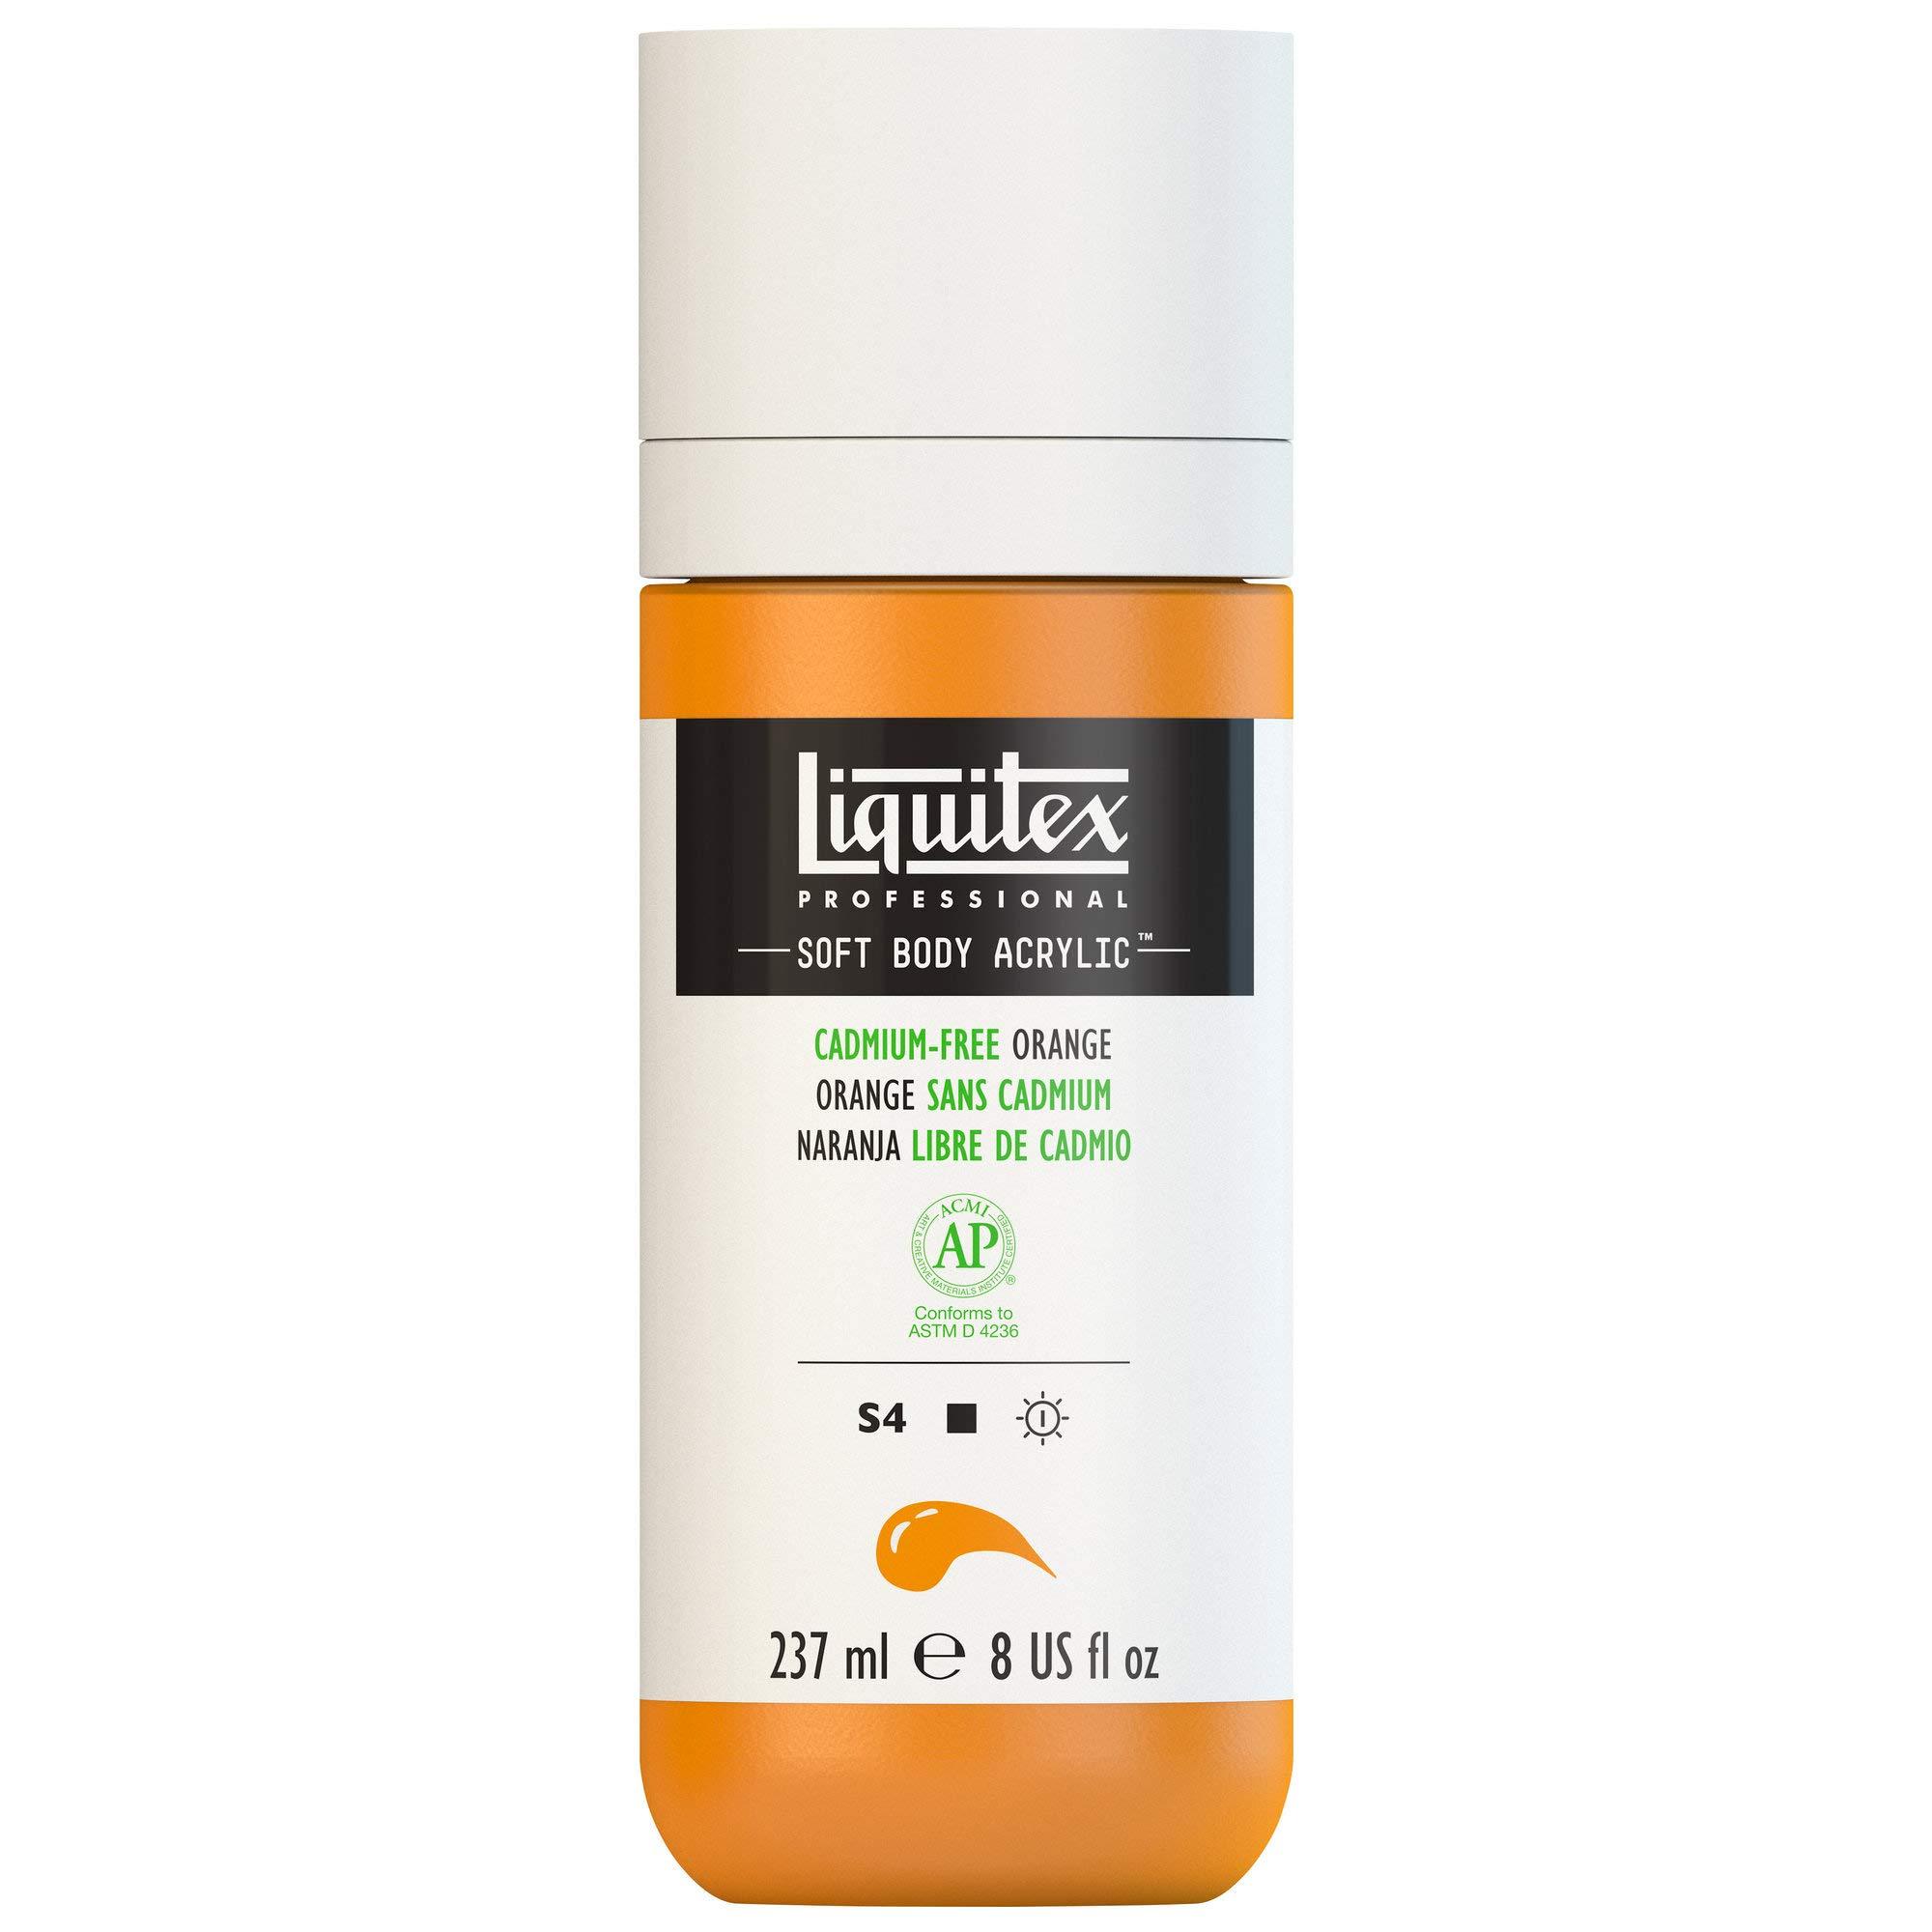 Liquitex Professional Soft Body Acrylic Paint 8-oz bottle, Cadmium-Free Orange